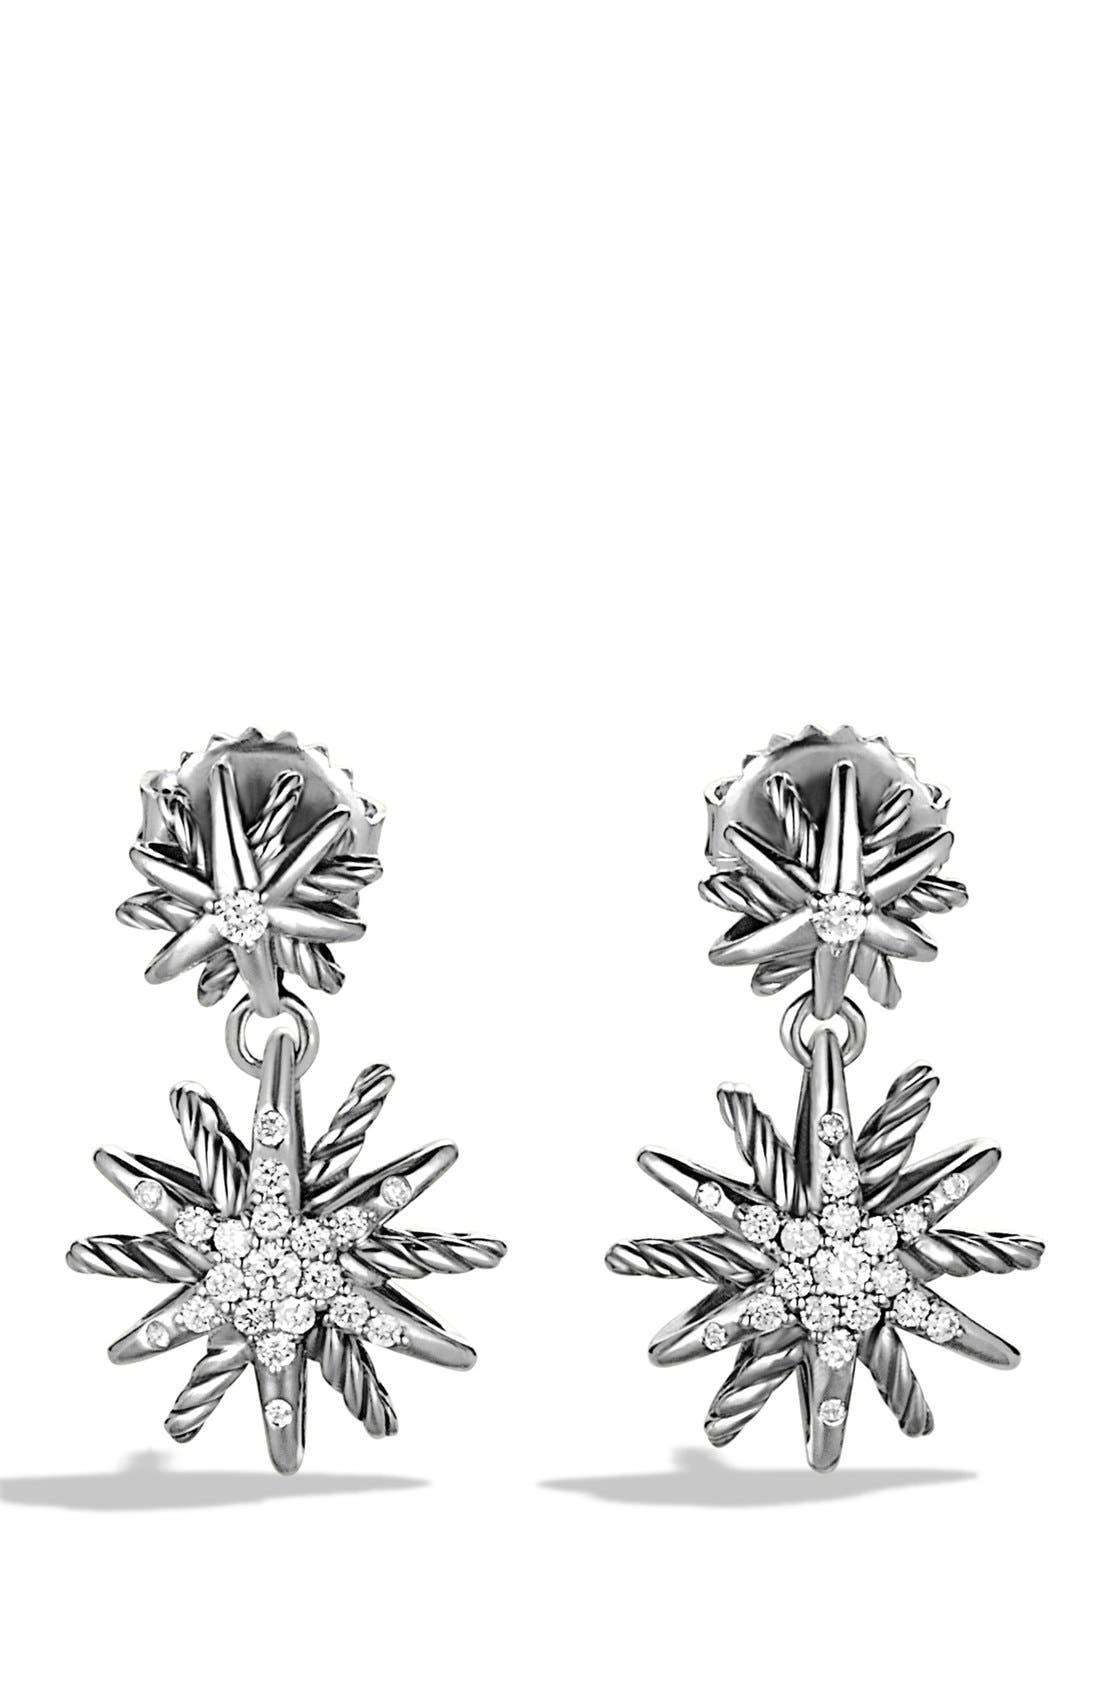 David Yurman 'Starburst' Double-Drop Earrings with Diamonds